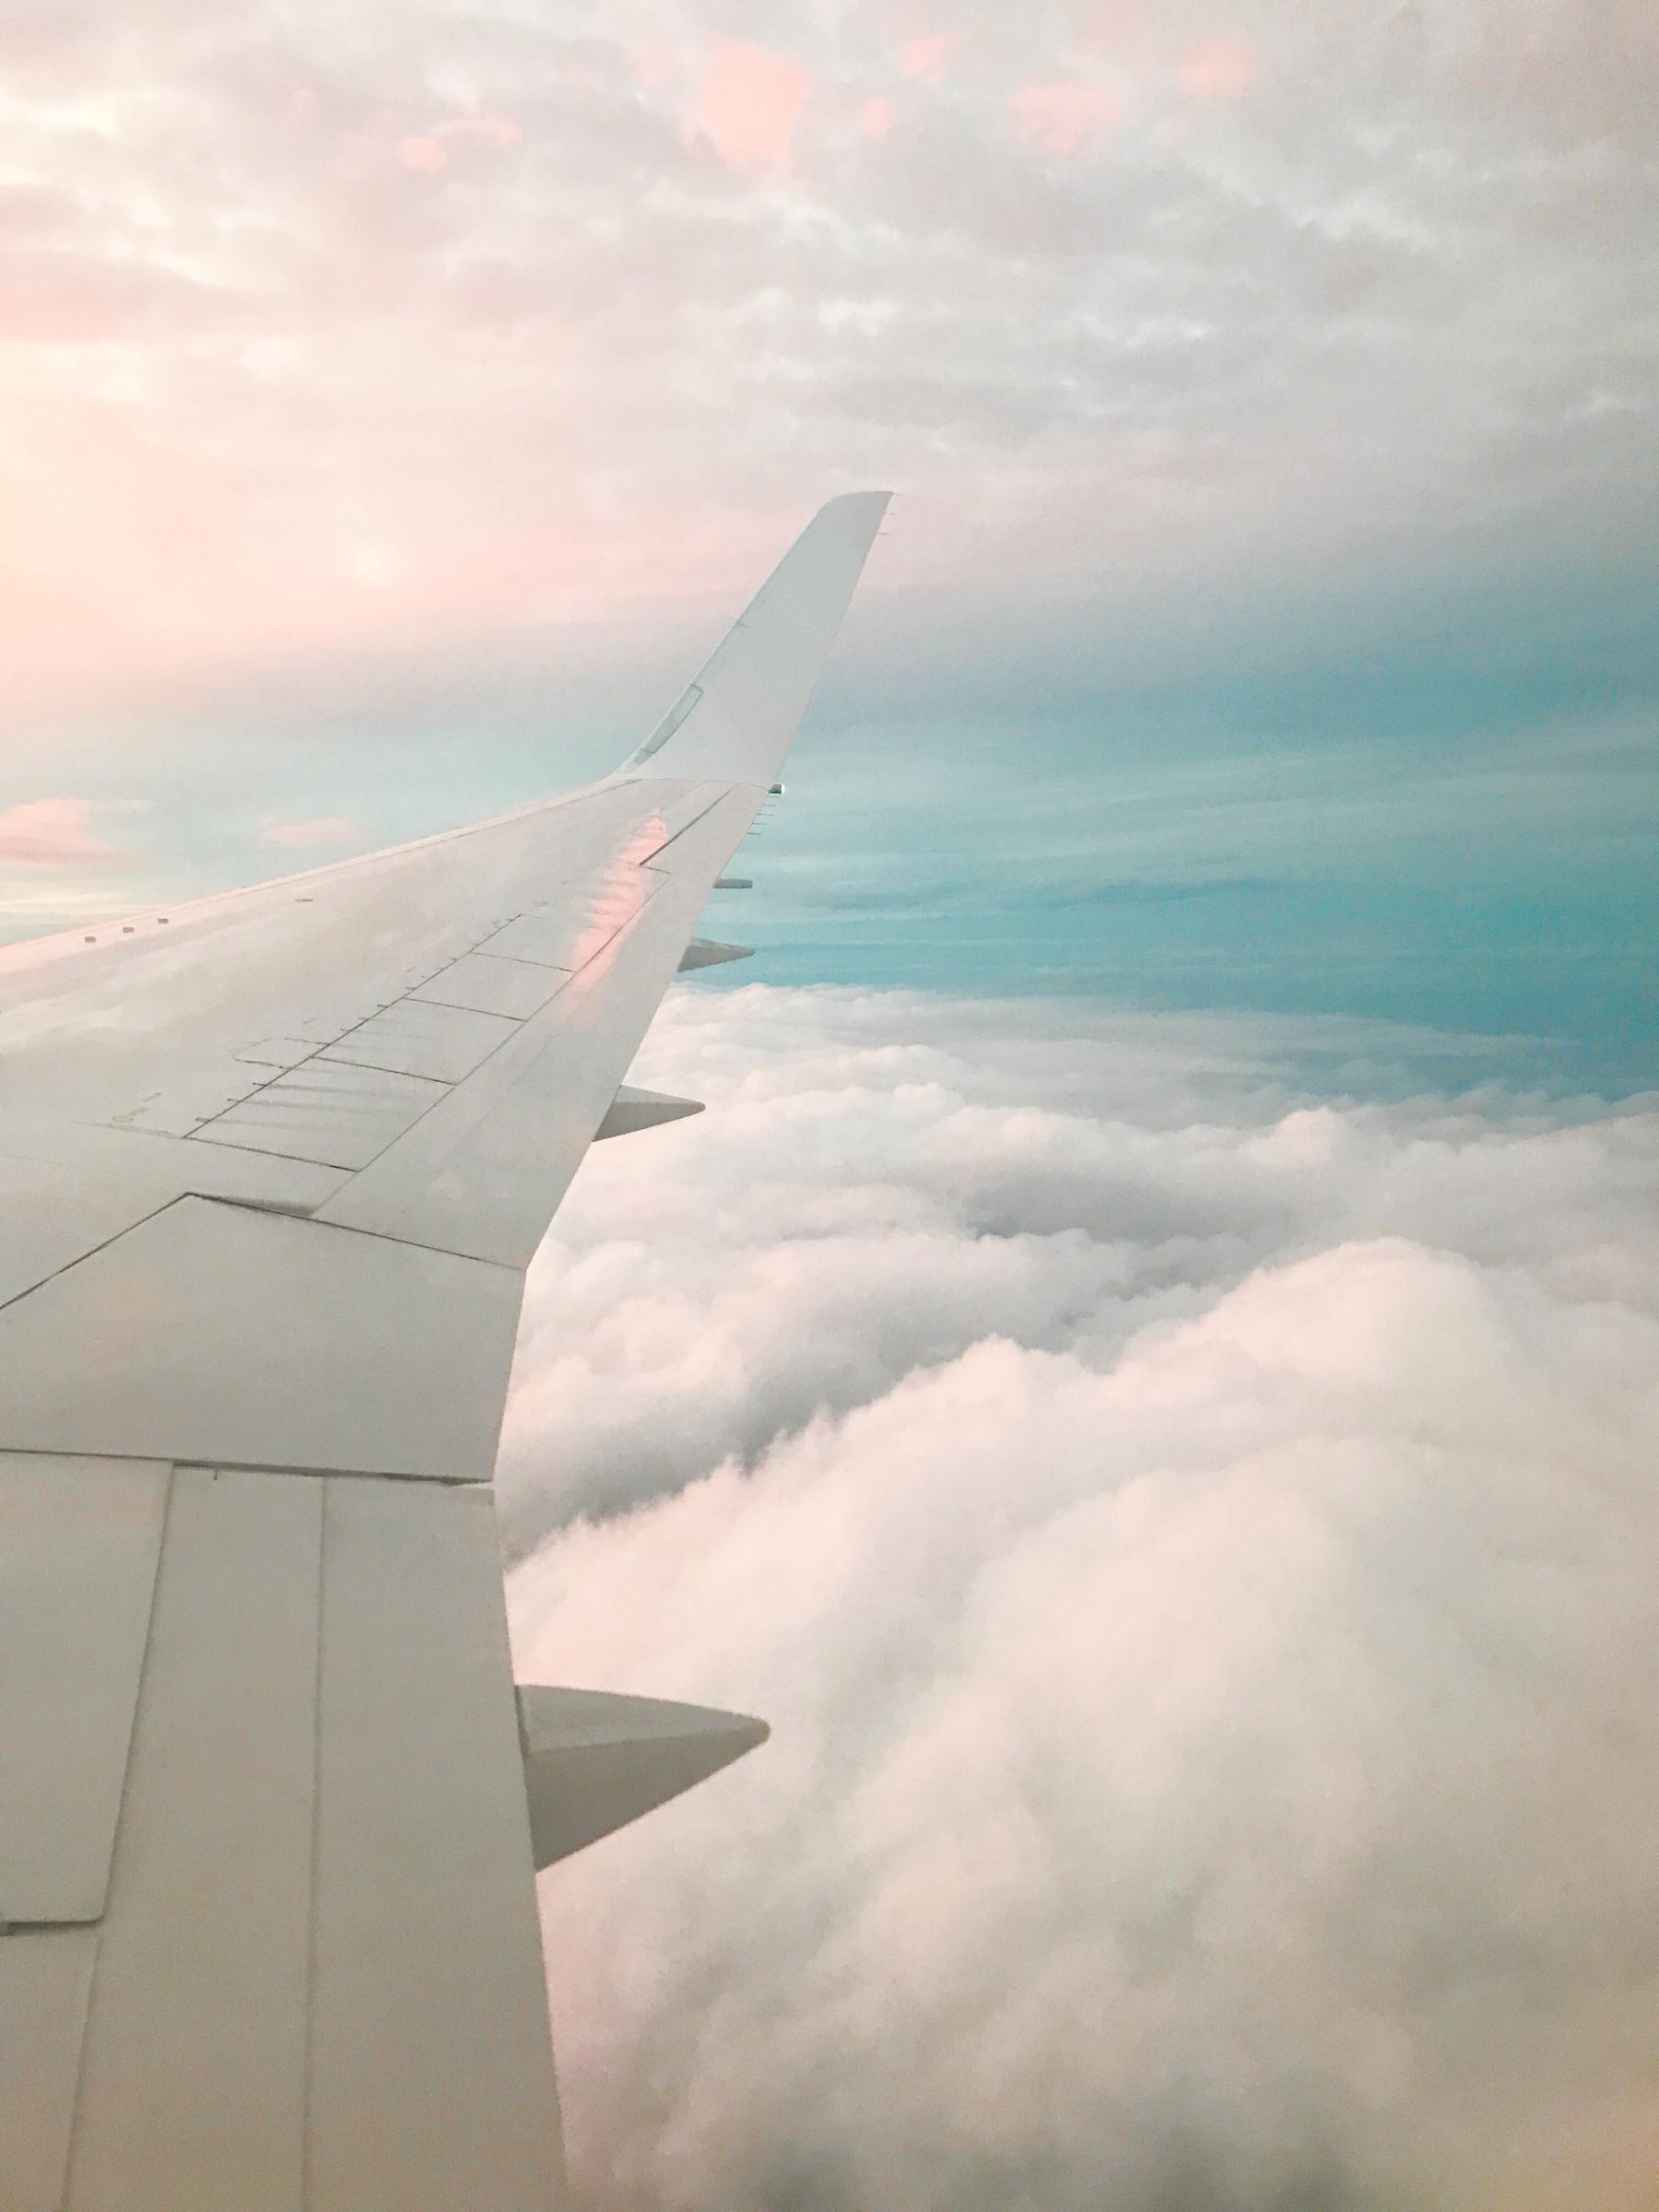 Best Travel Pillow For Long Haul Flights